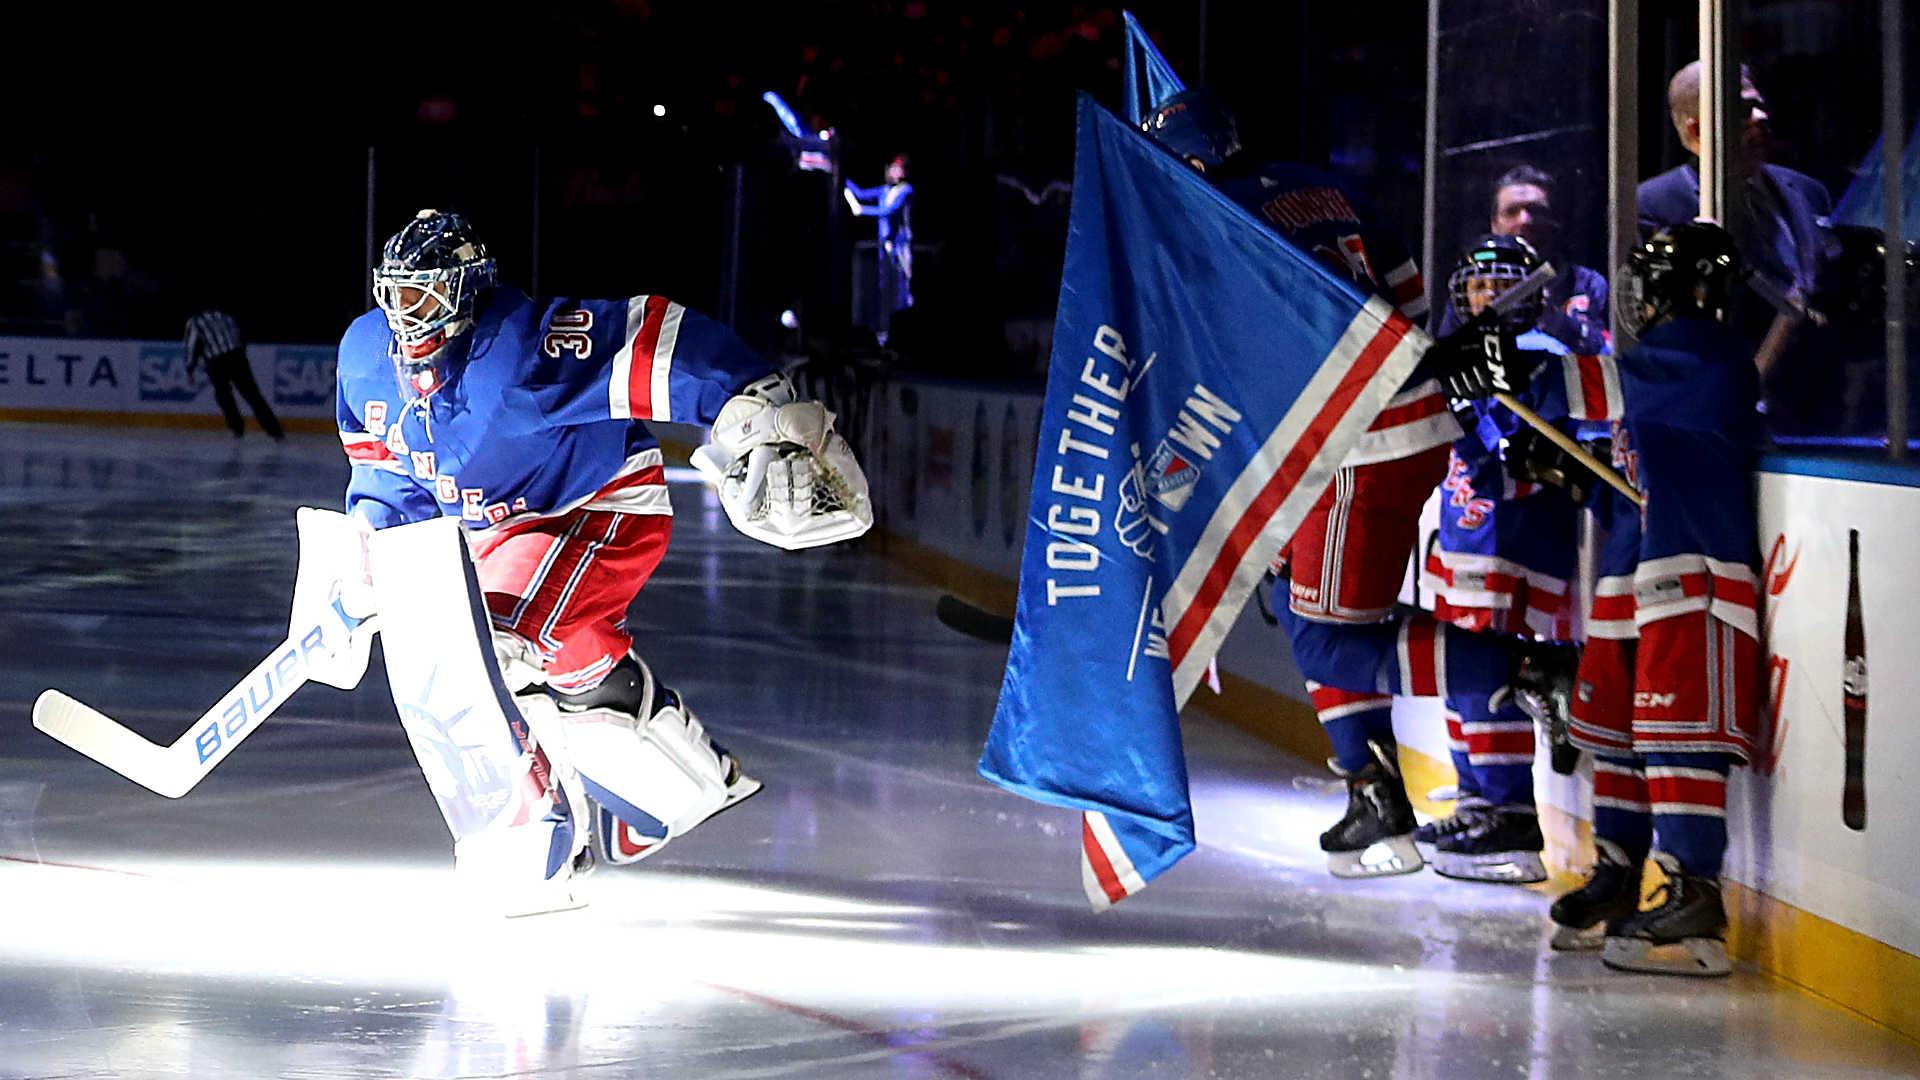 Ex-Rangers goalies reflect on Henrik Lundqvist's tenure in New York: 'He was a rock star'